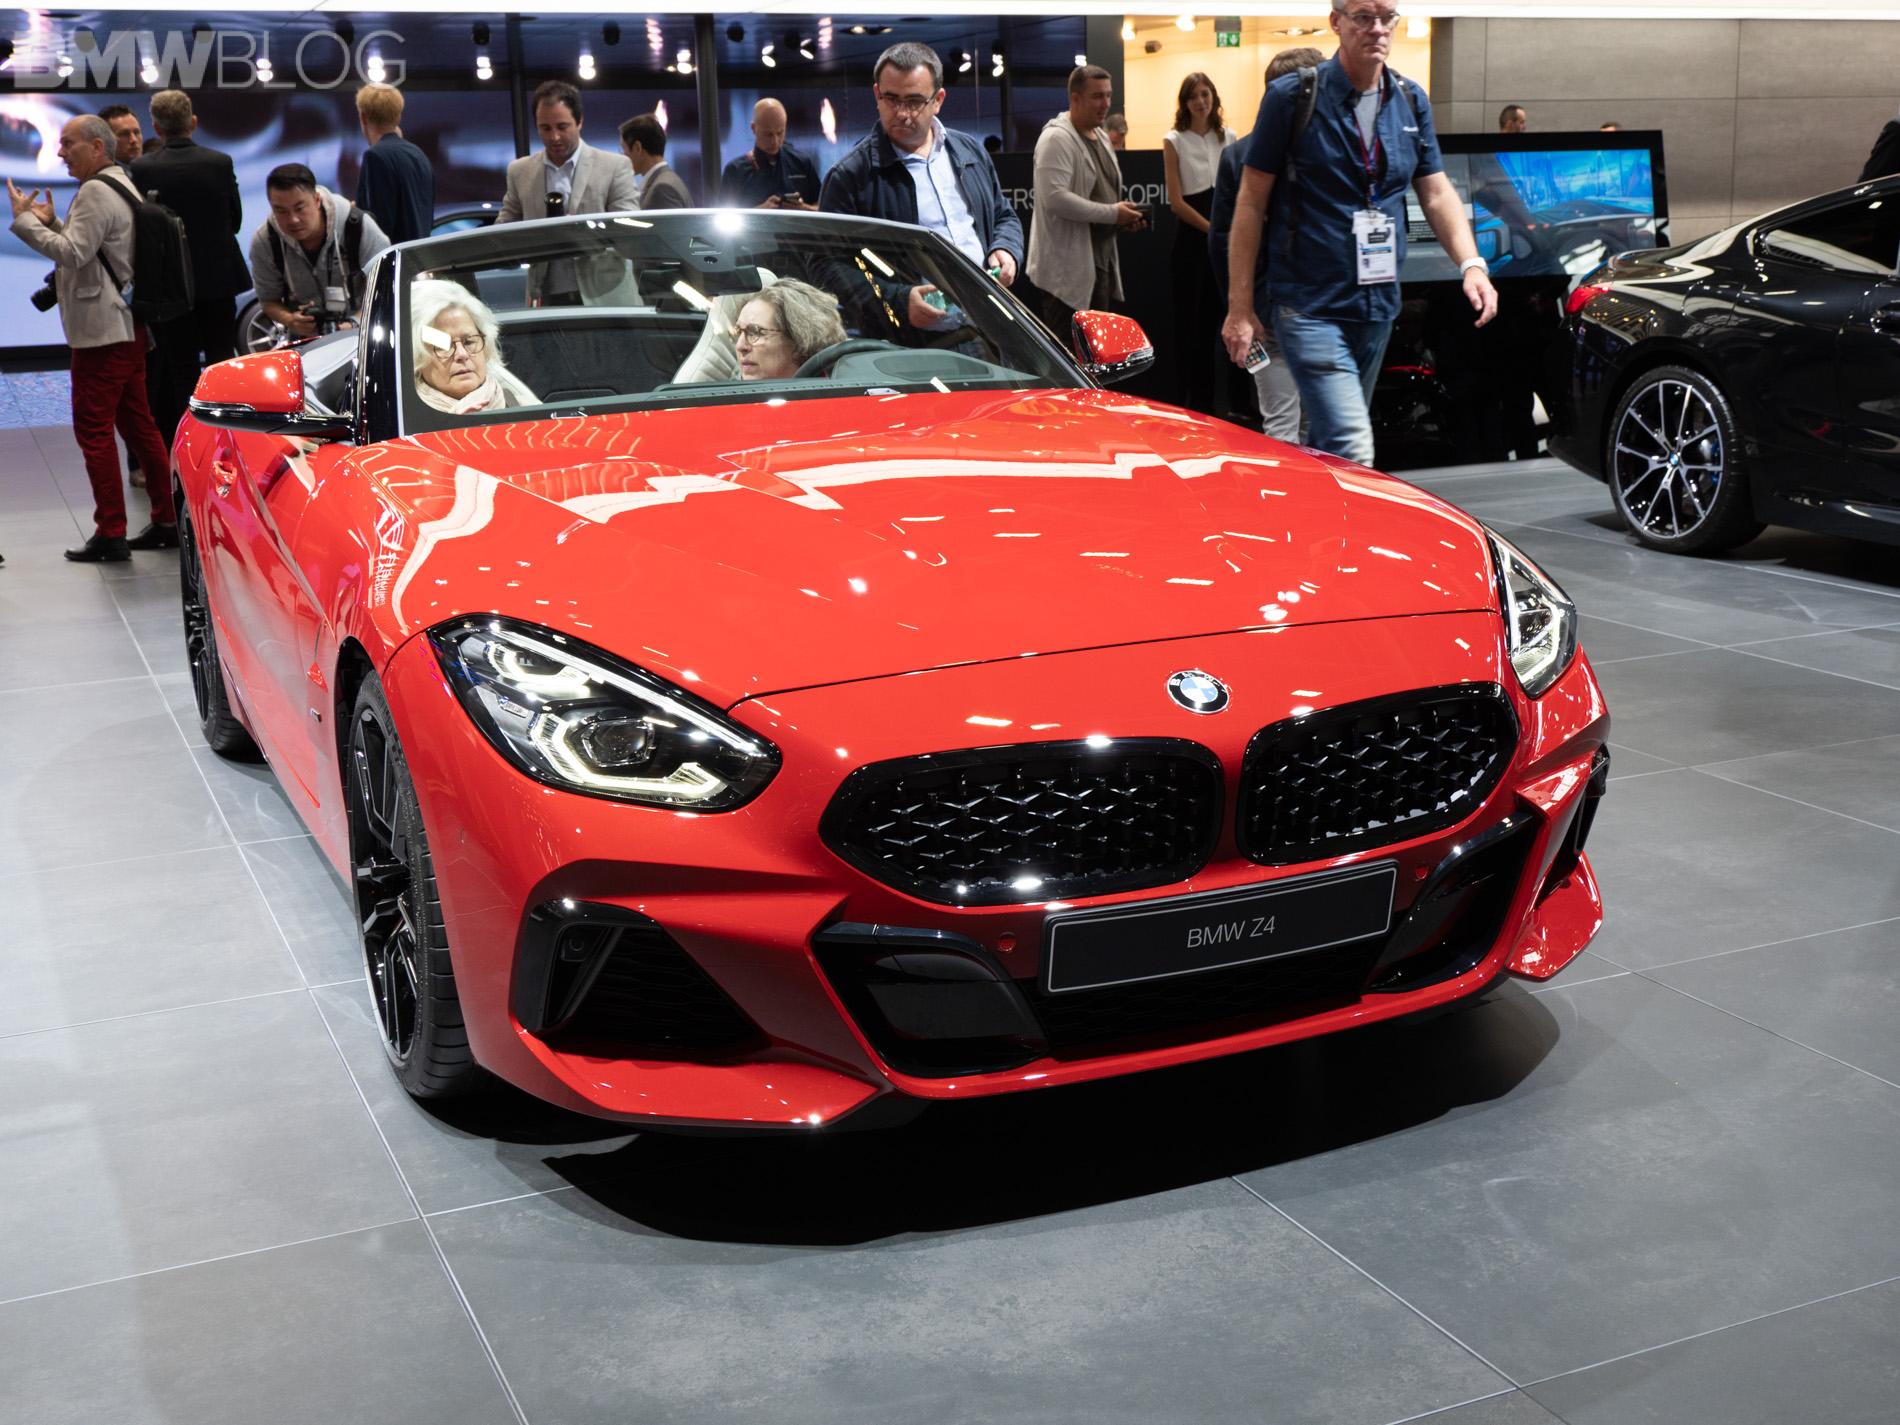 Paris 2018 New Bmw Z4 M40i In San Francisco Red